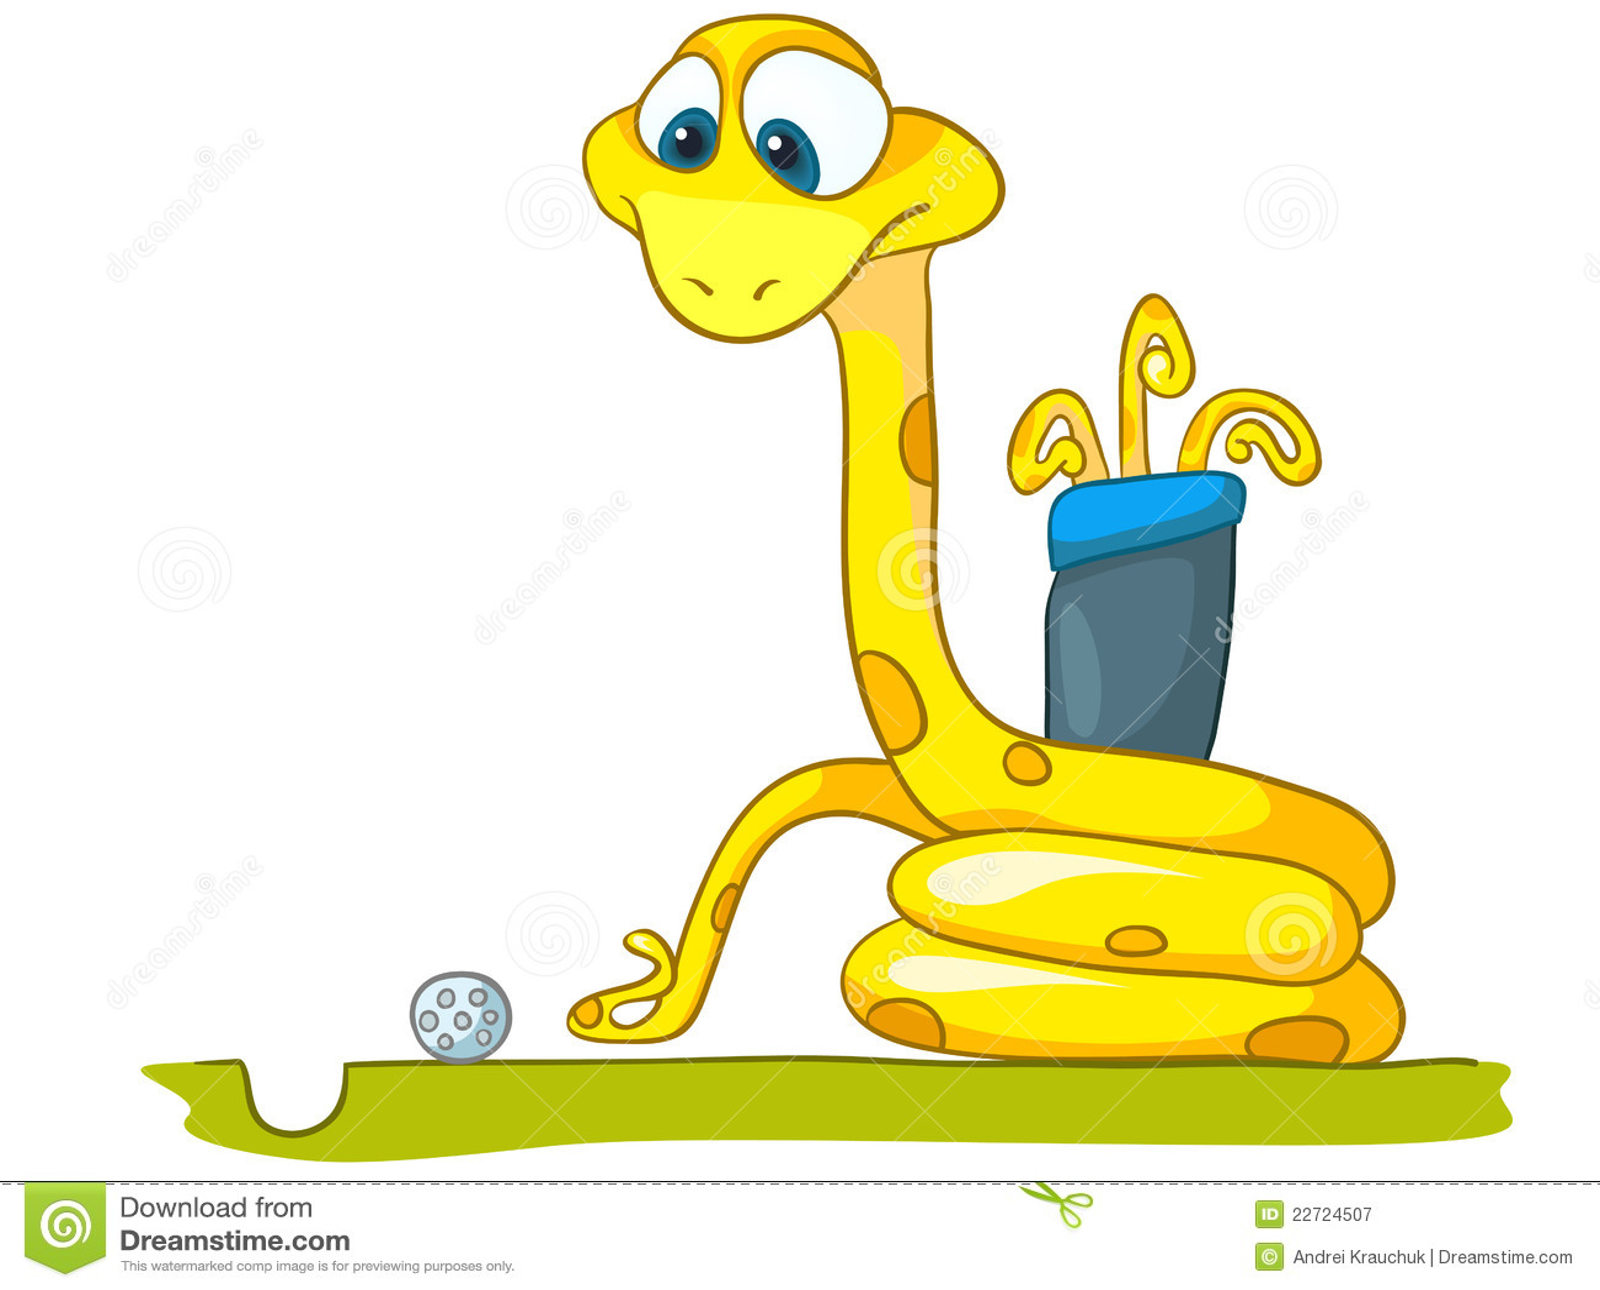 Green snake cartoon royalty free stock image image 19462406 - Cartoon Character Snake Royalty Free Stock Photography Wallpaper Gallery Snake In Bottle Cartoon Royalty Free